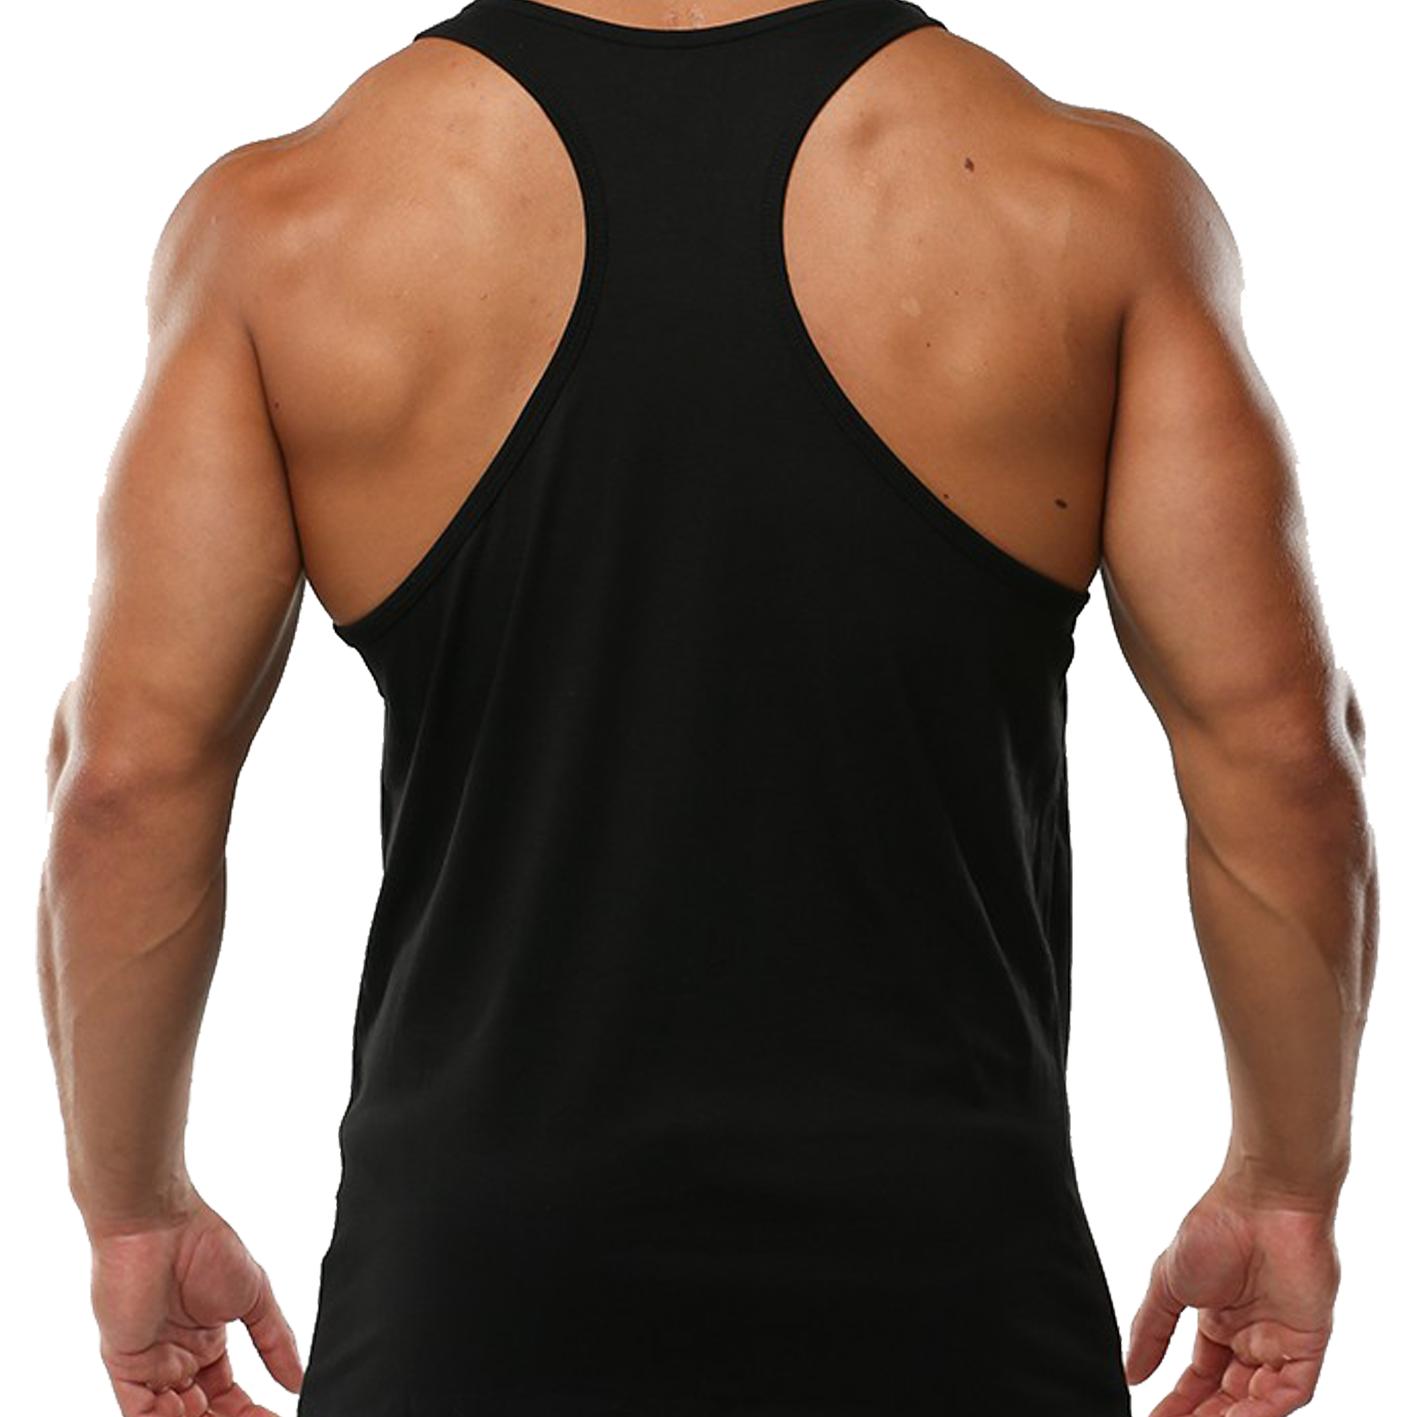 Mens Gym Vest Plain Stringer Bodybuilding Muscle Training Top Fitness Singlet 6